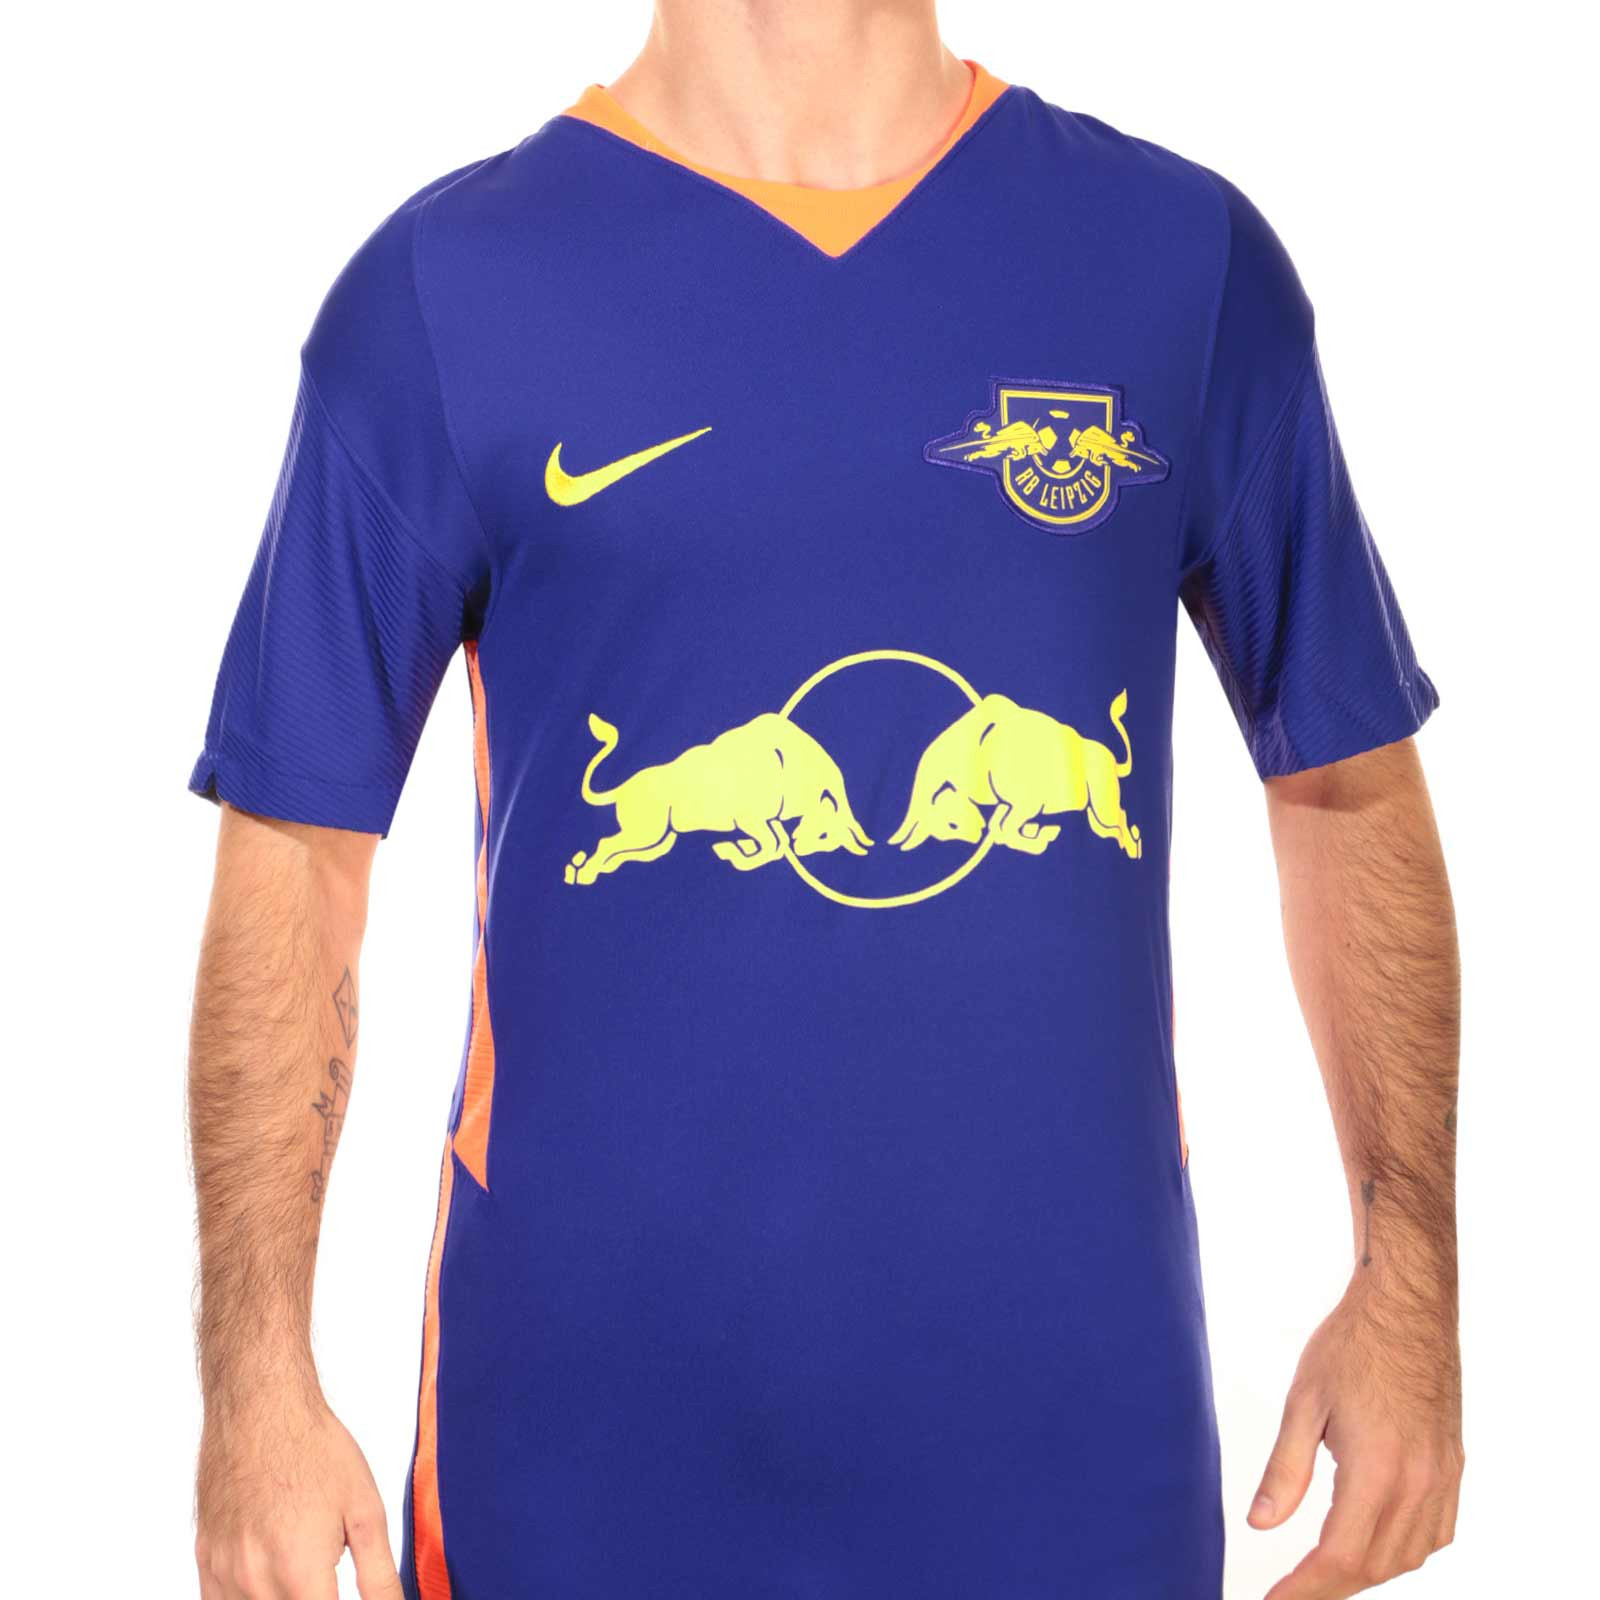 Enviar Cuota de admisión residuo  Camiseta Nike 2a Red Bull Leipzig 2020 2021 Stadium   futbolmania